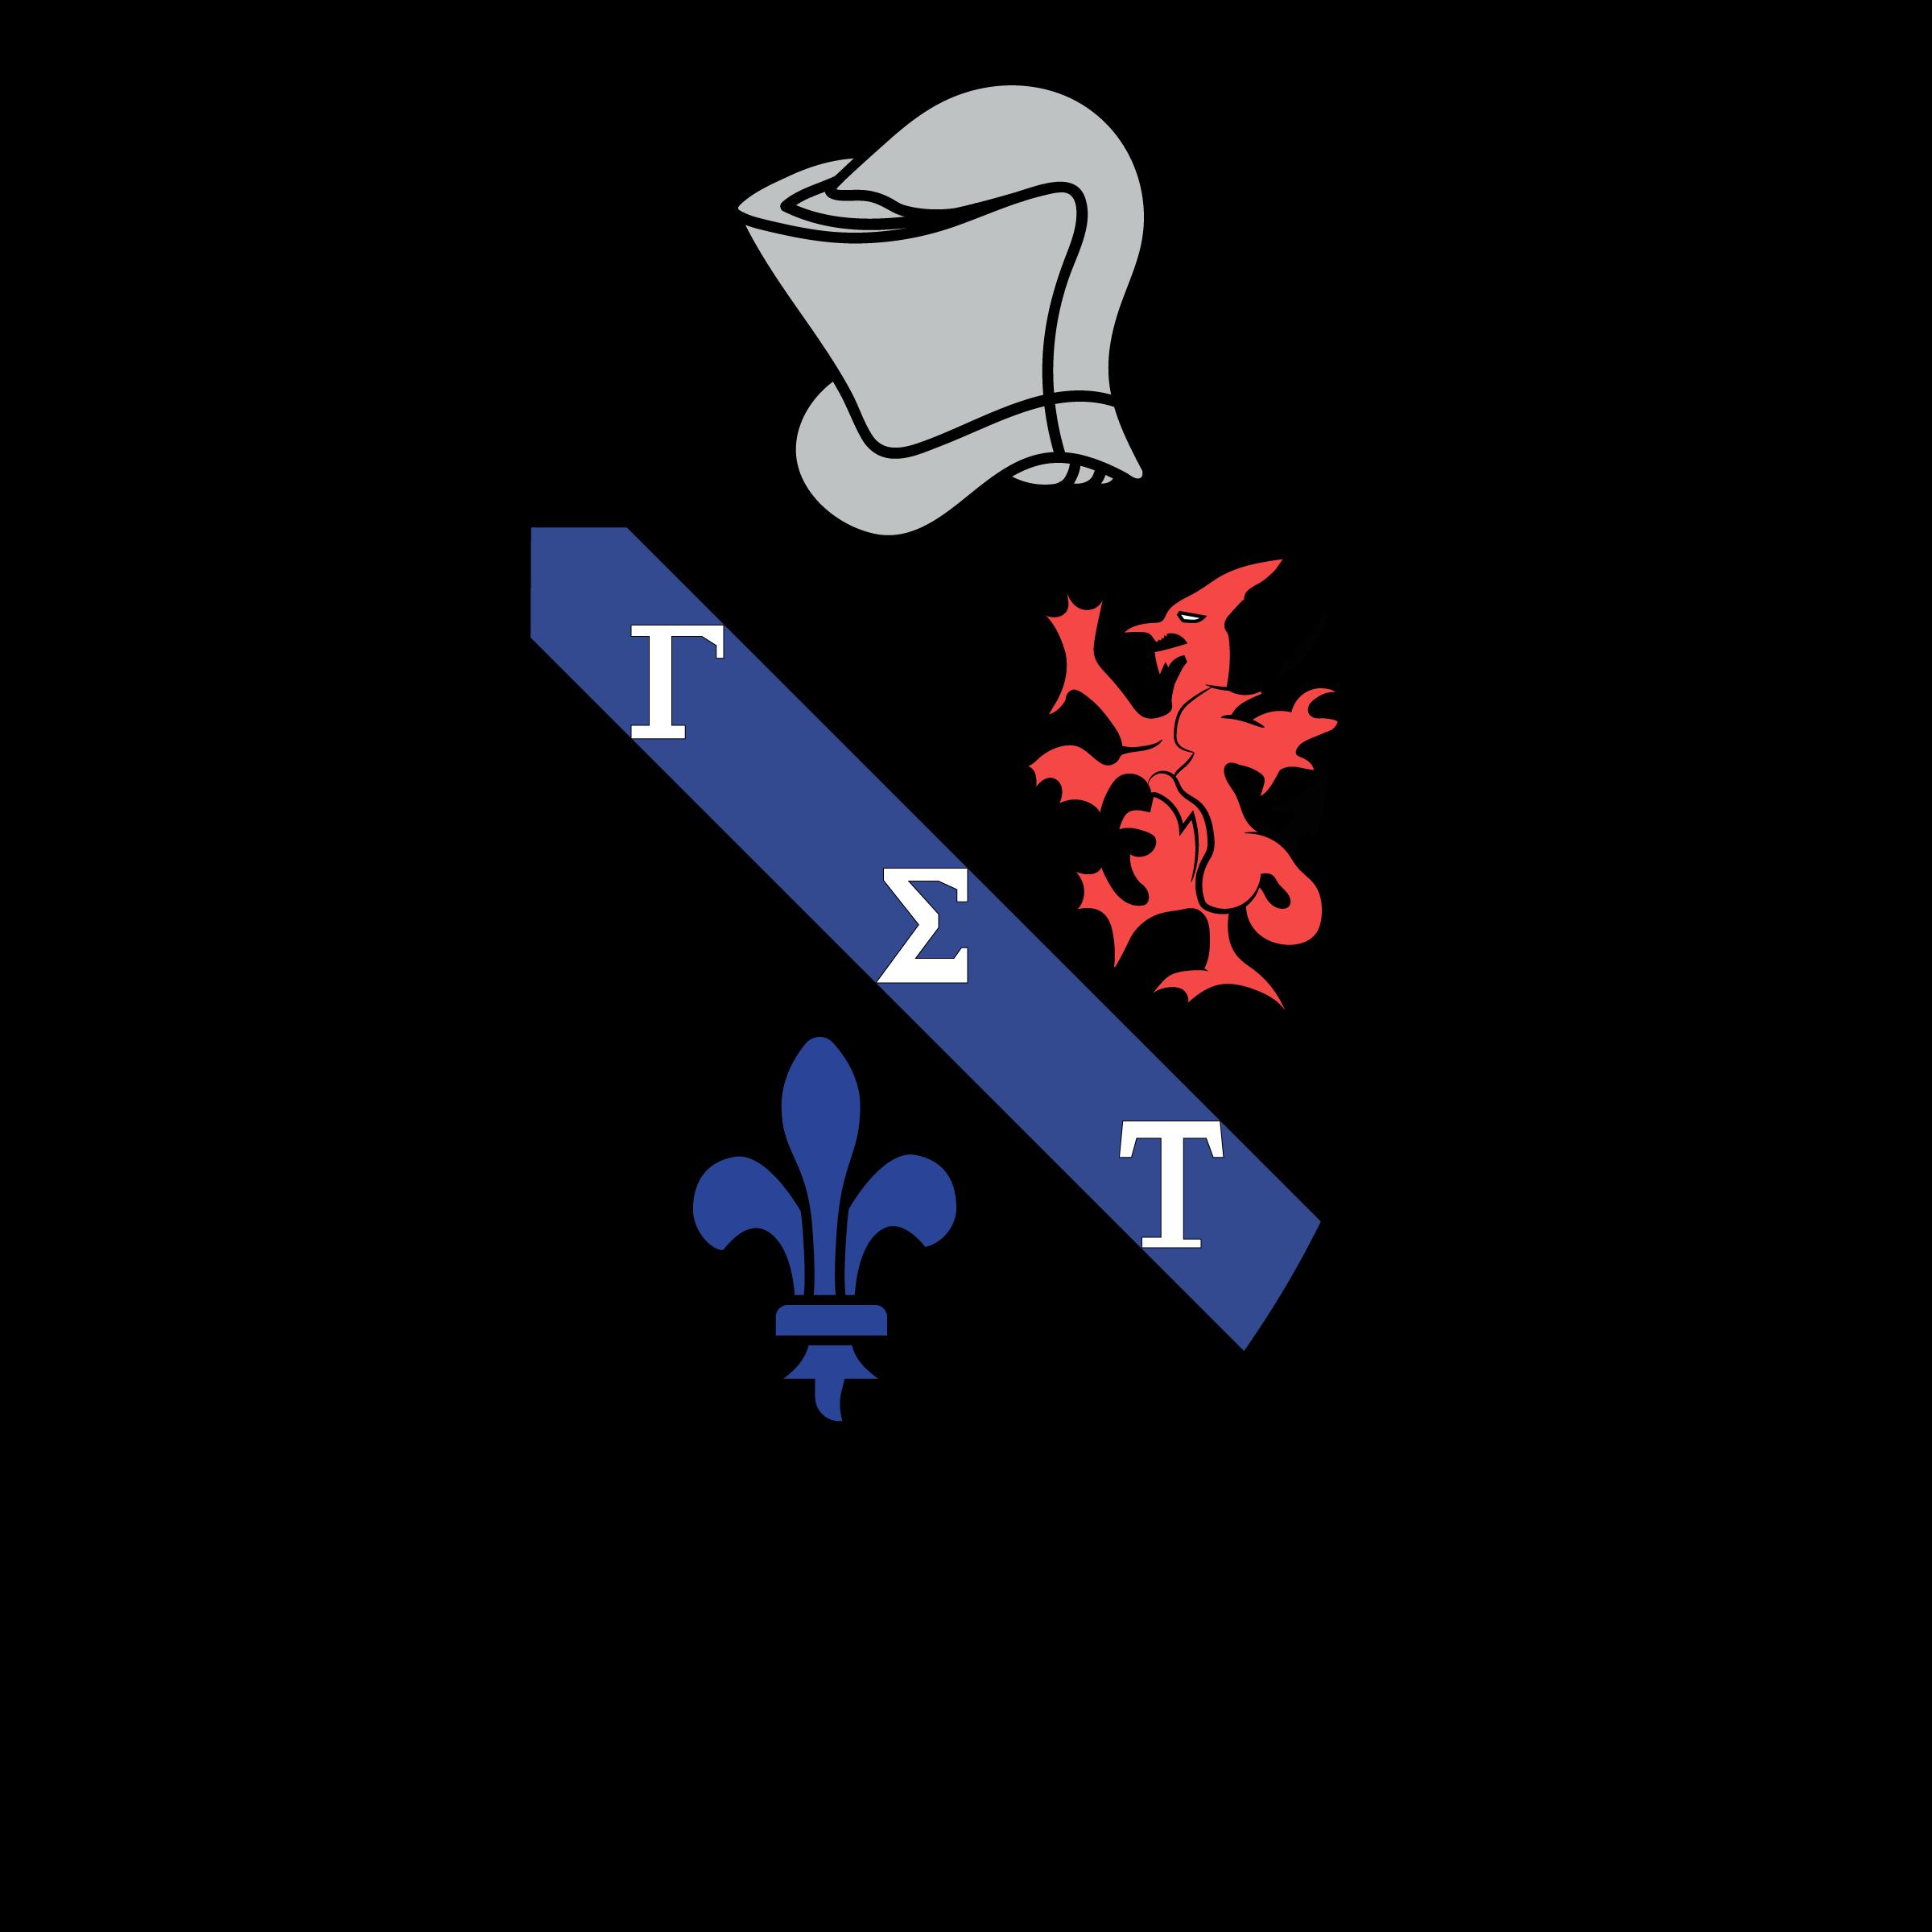 Delphic Crest